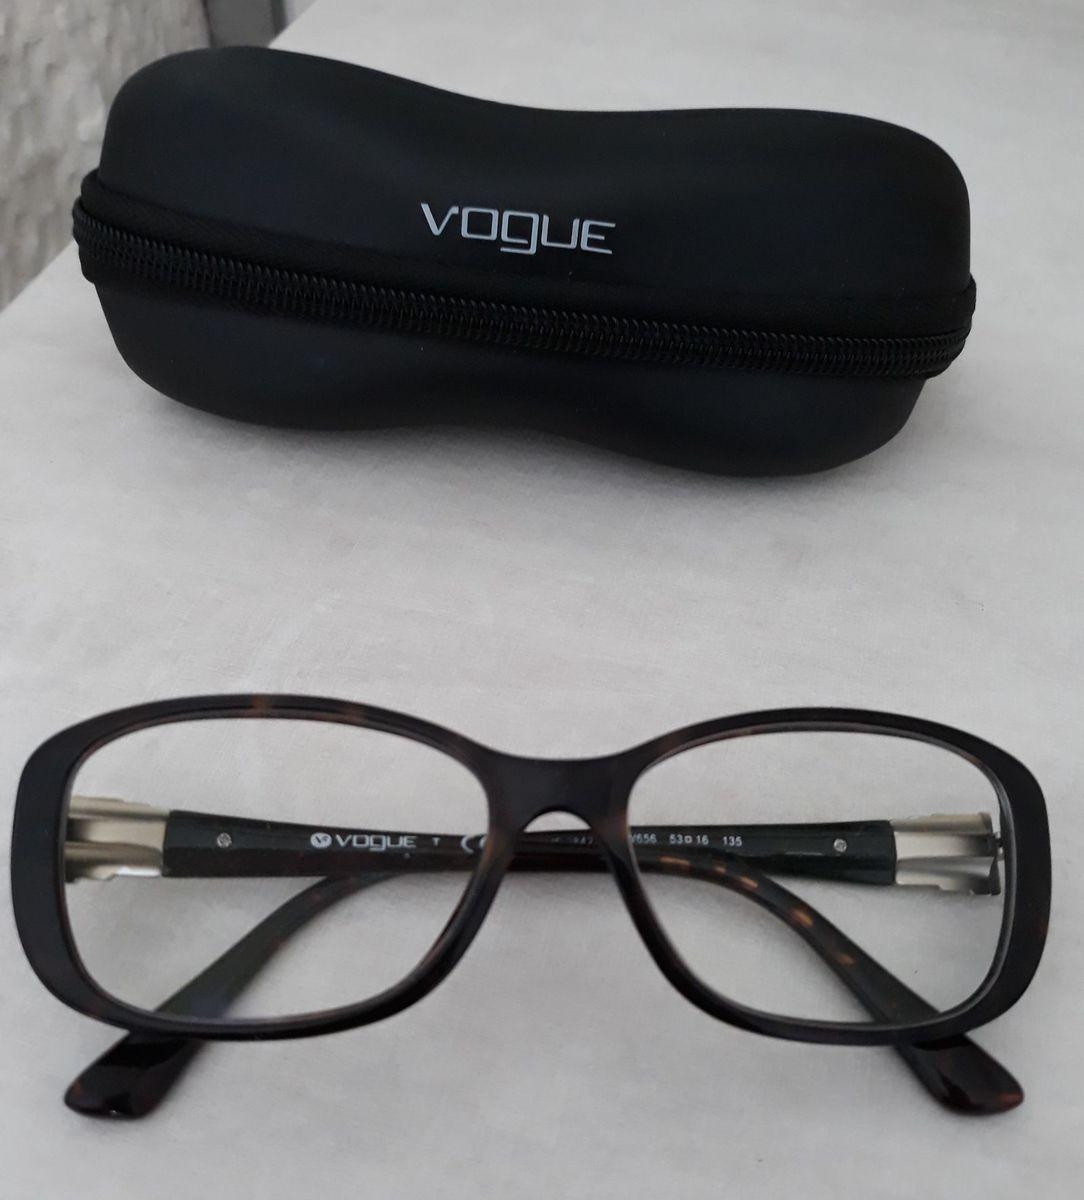 cbe62edd5e0e3 armação óculos de grau vogue - óculos vogue.  Czm6ly9wag90b3muzw5qb2vplmnvbs5ici9wcm9kdwn0cy83nzu0ntuzlzg5ndgyotq2njy2zty4n2y4mtq0m2q0odi3ndlhnzq0lmpwzw  ...